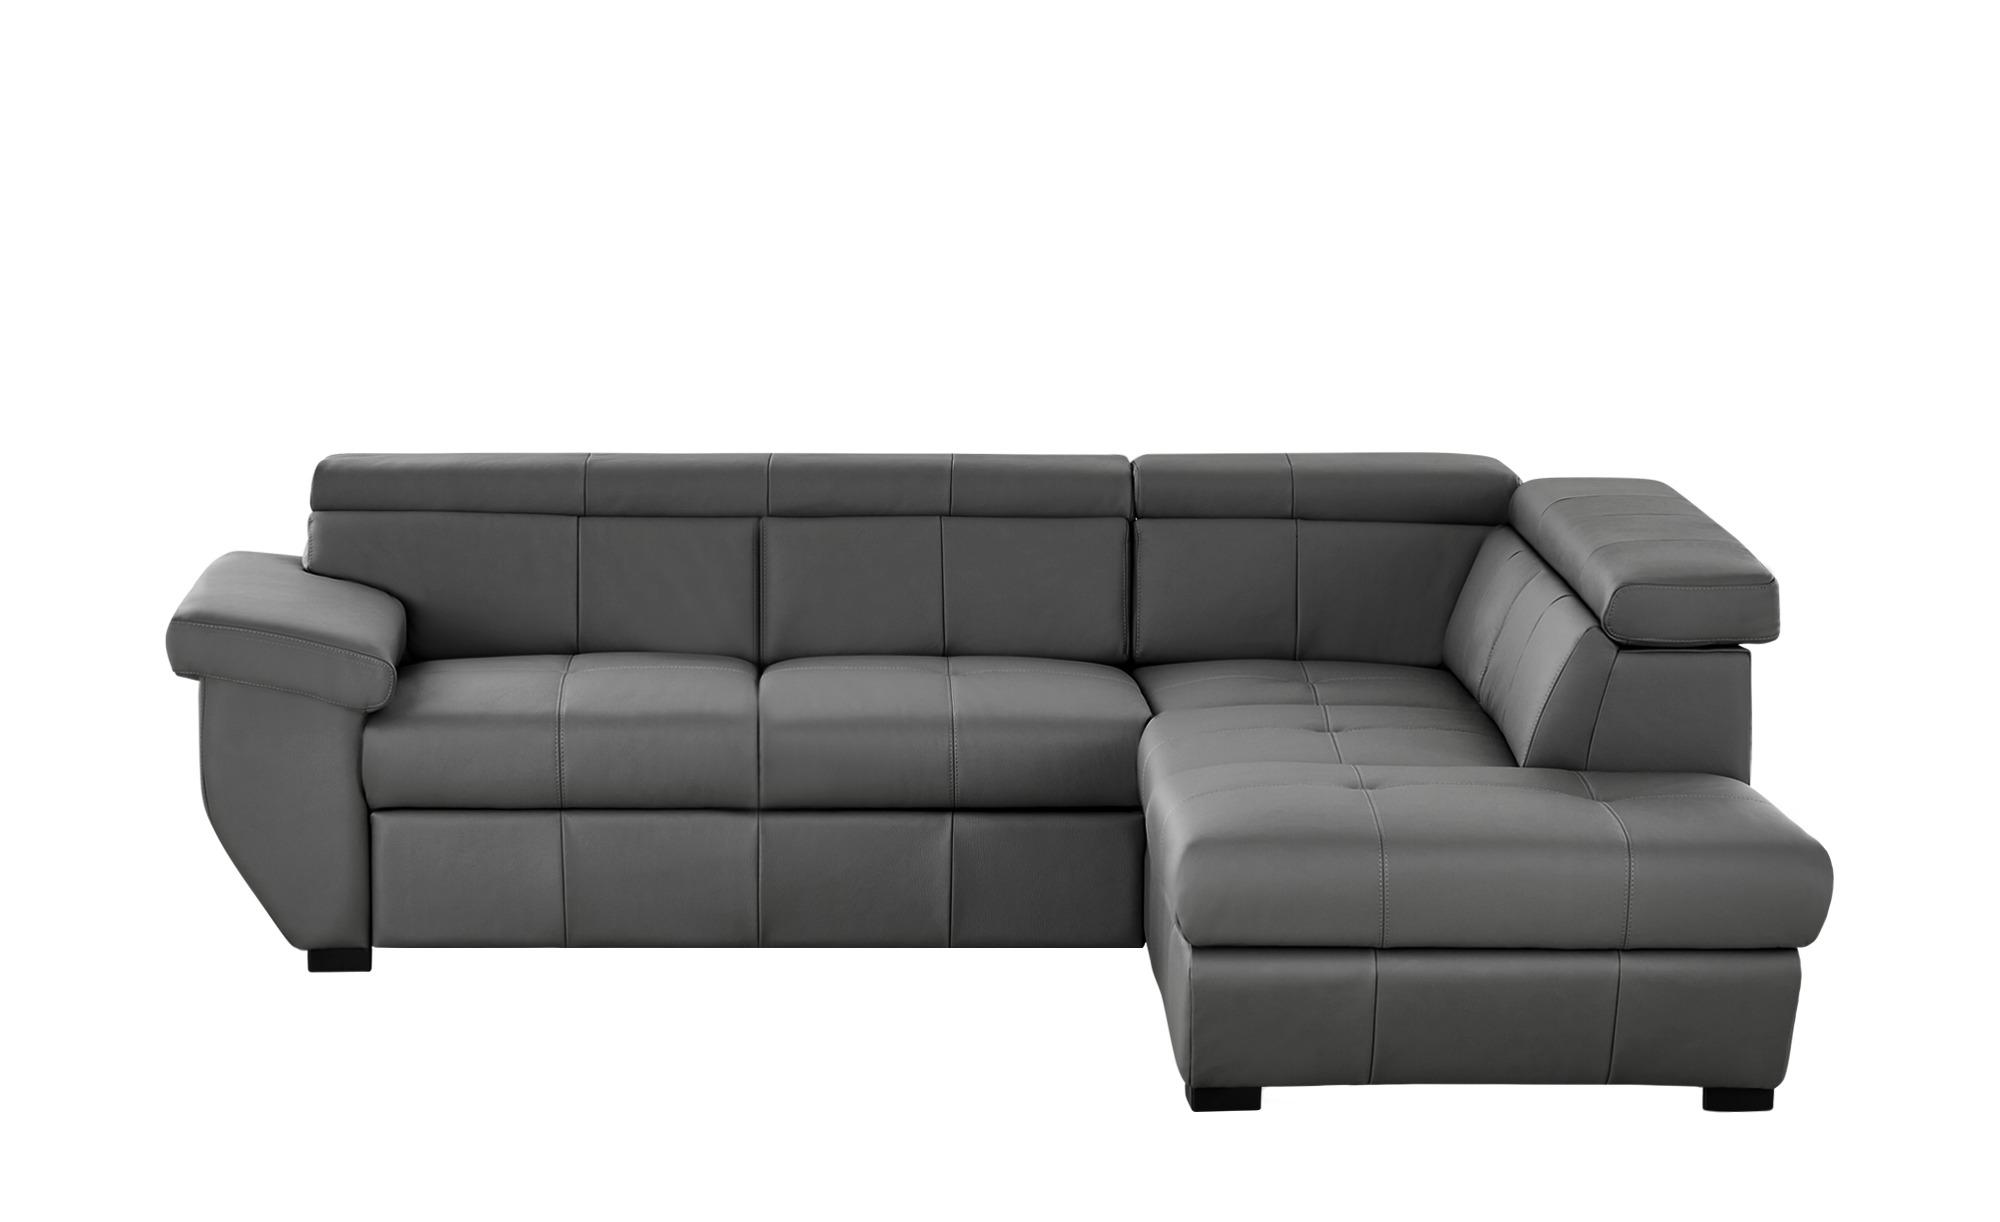 Full Size of Uno Ecksofa Grau Leder Formula Moderne Couch Hussen Sofa Antik Graues Big Mit Schlaffunktion Bettfunktion Xora Rund Rolf Benz Hocker Echtleder Xxl Günstig Sofa Sofa Grau Leder